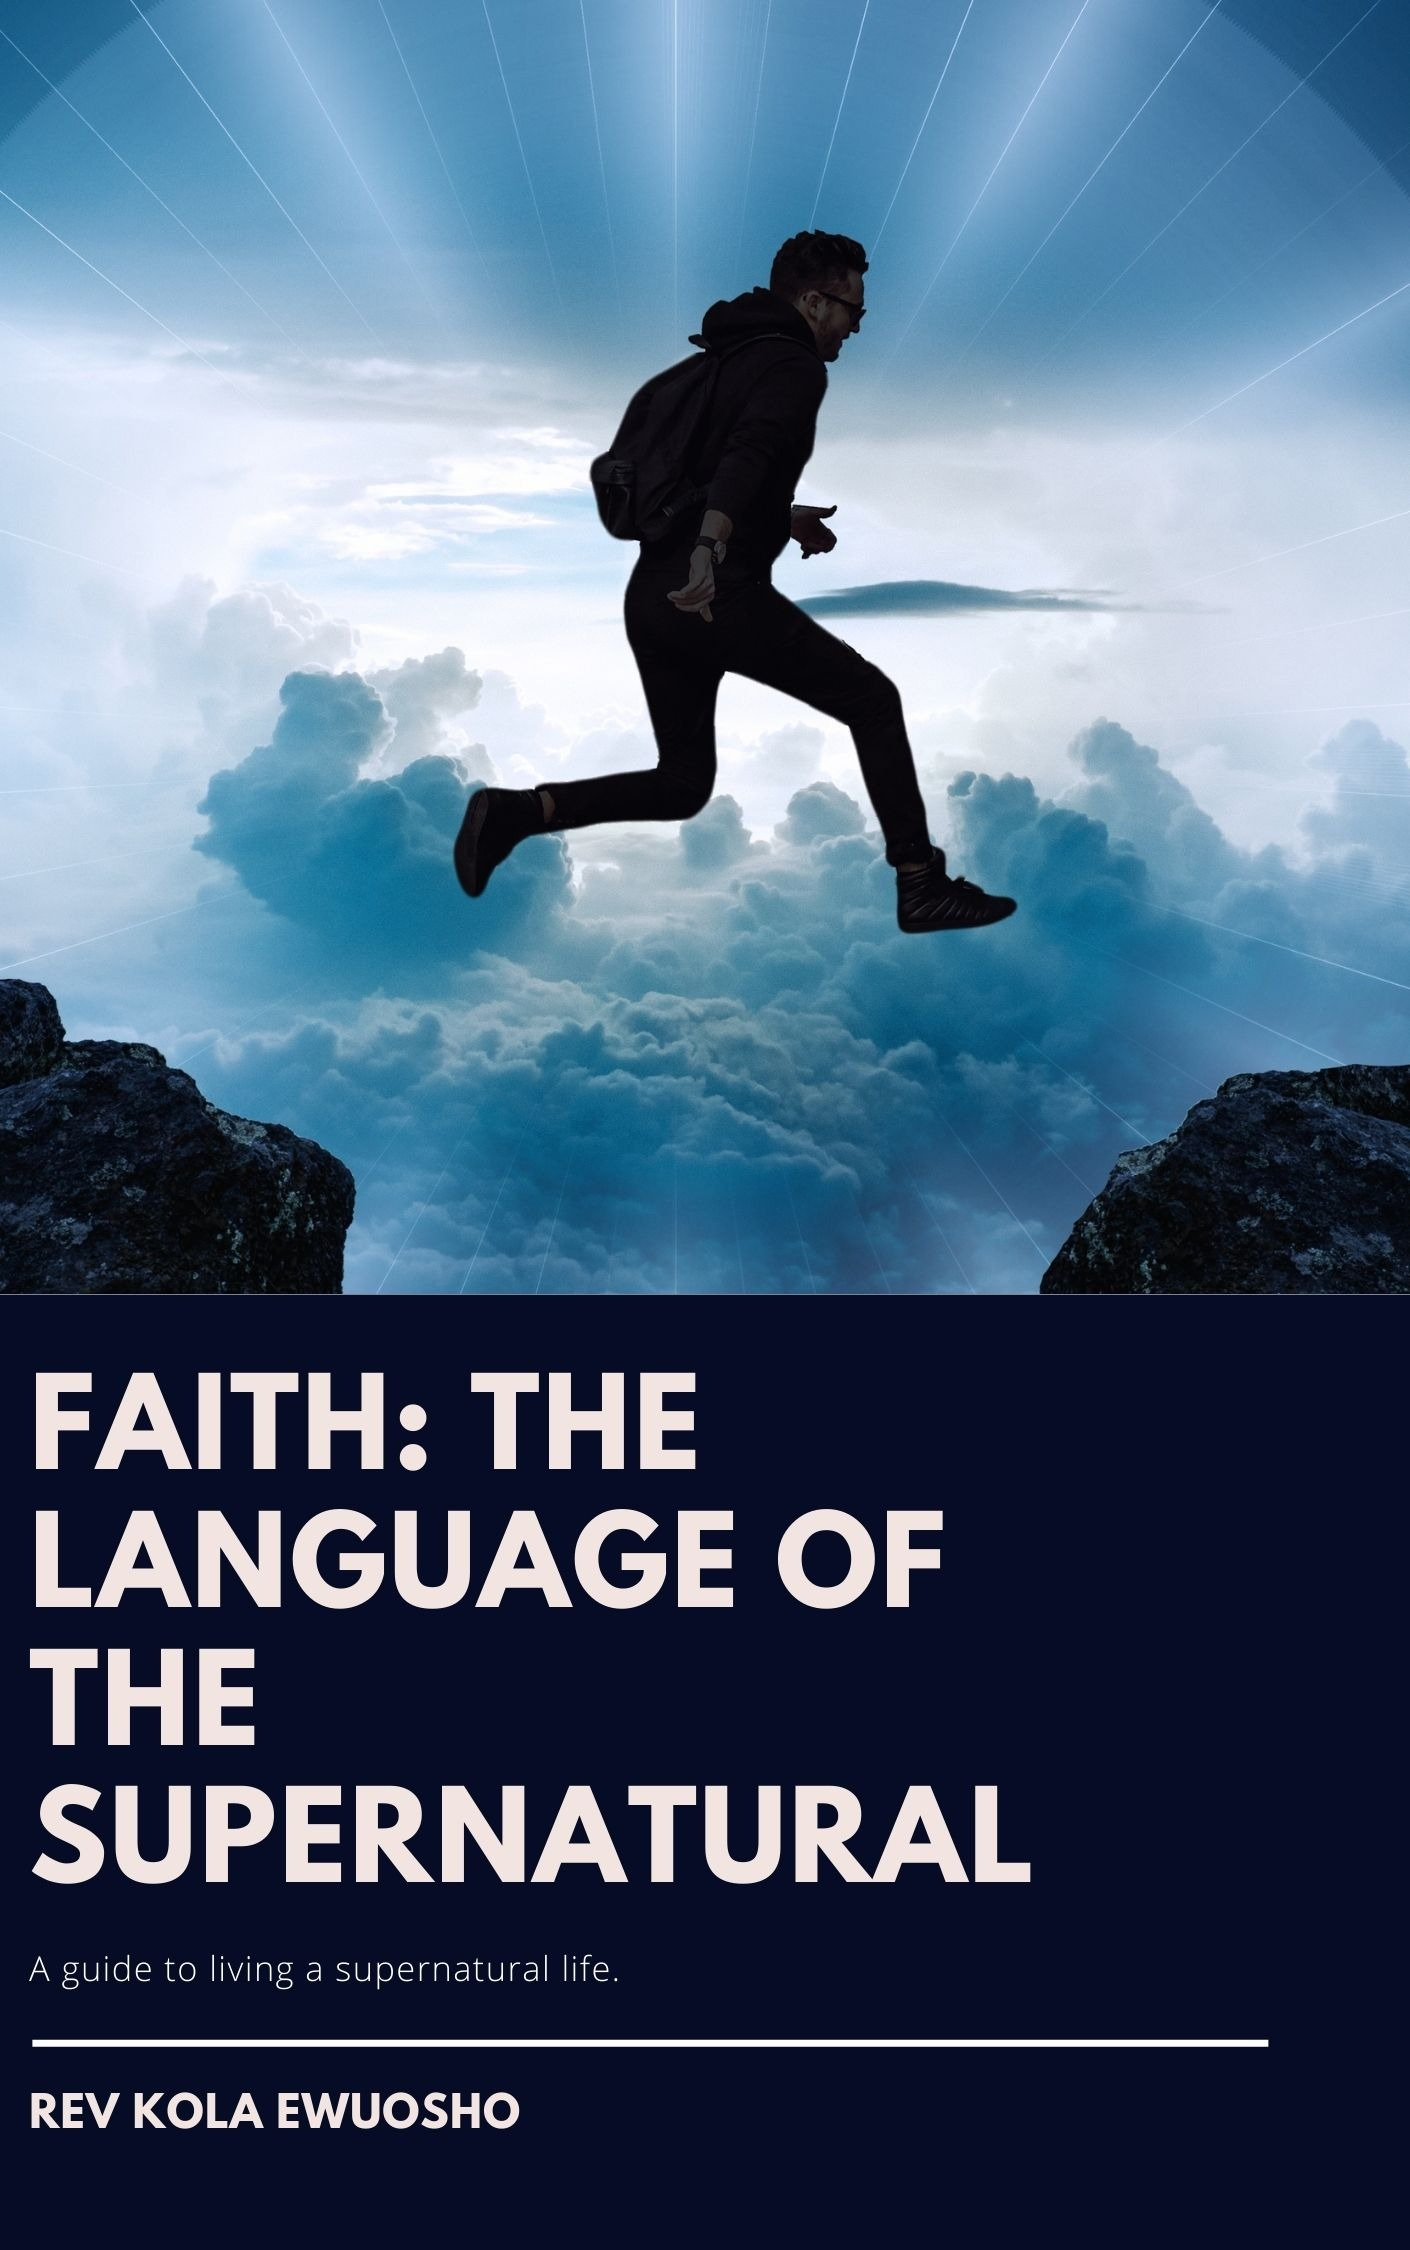 FAITH: THE LANGUAGE OF THE SUPERNATURAL